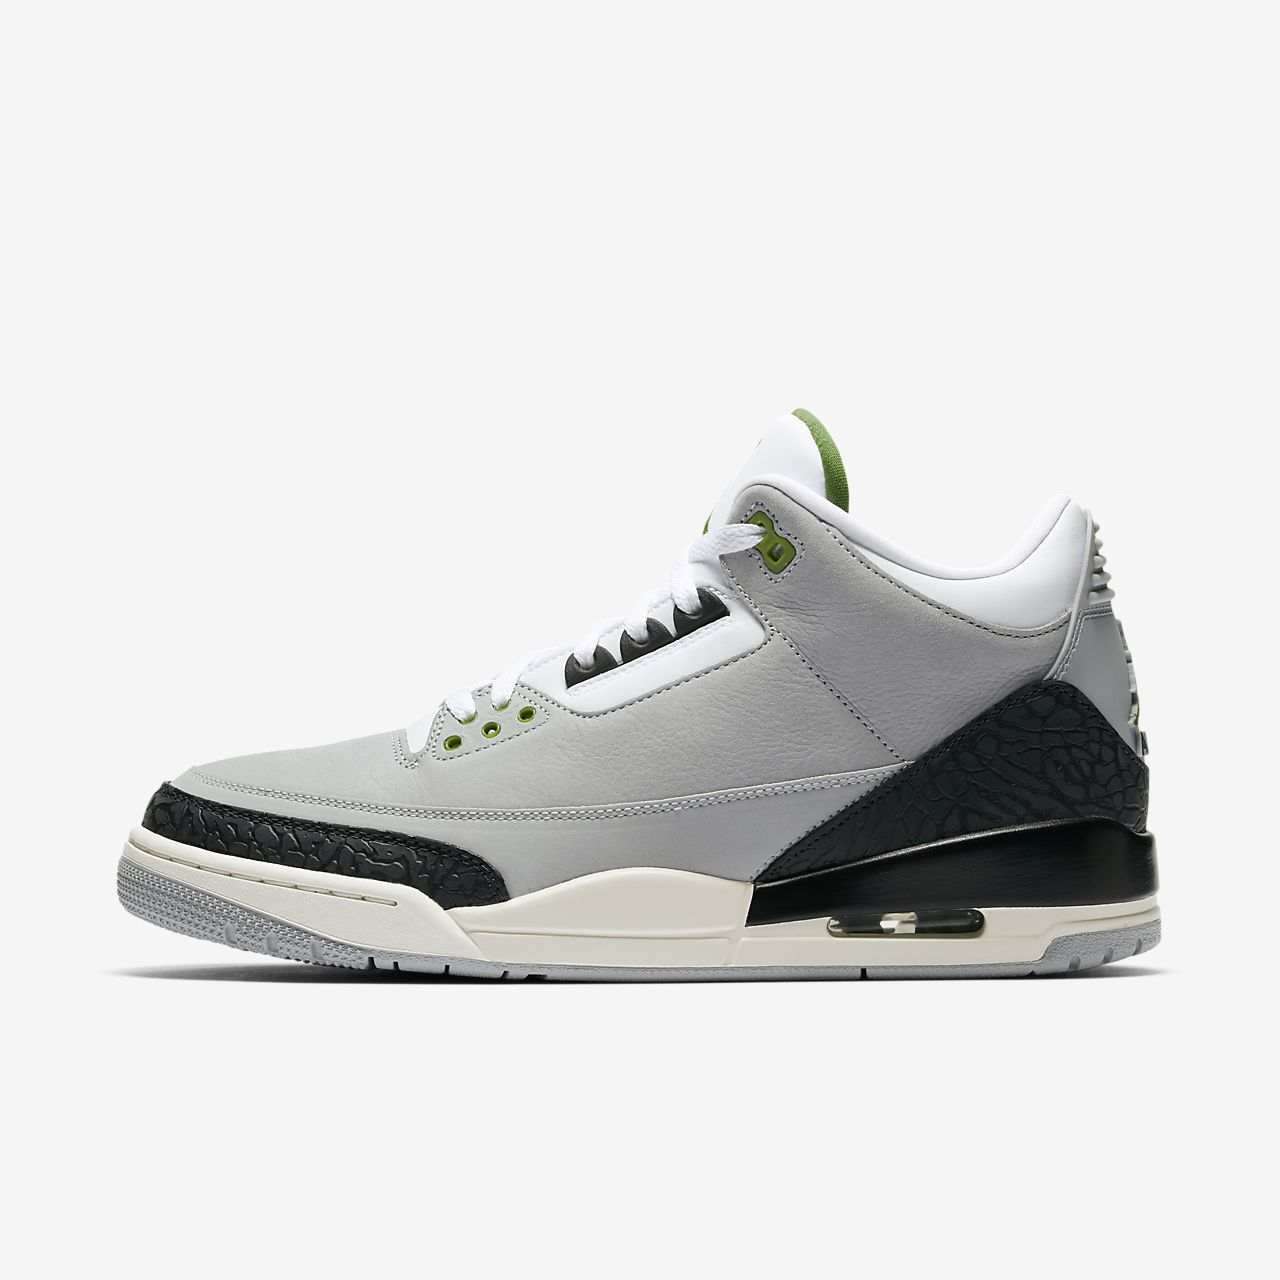 new arrival 3266b 8e016 Air Jordan 3 Retro-sko til mænd